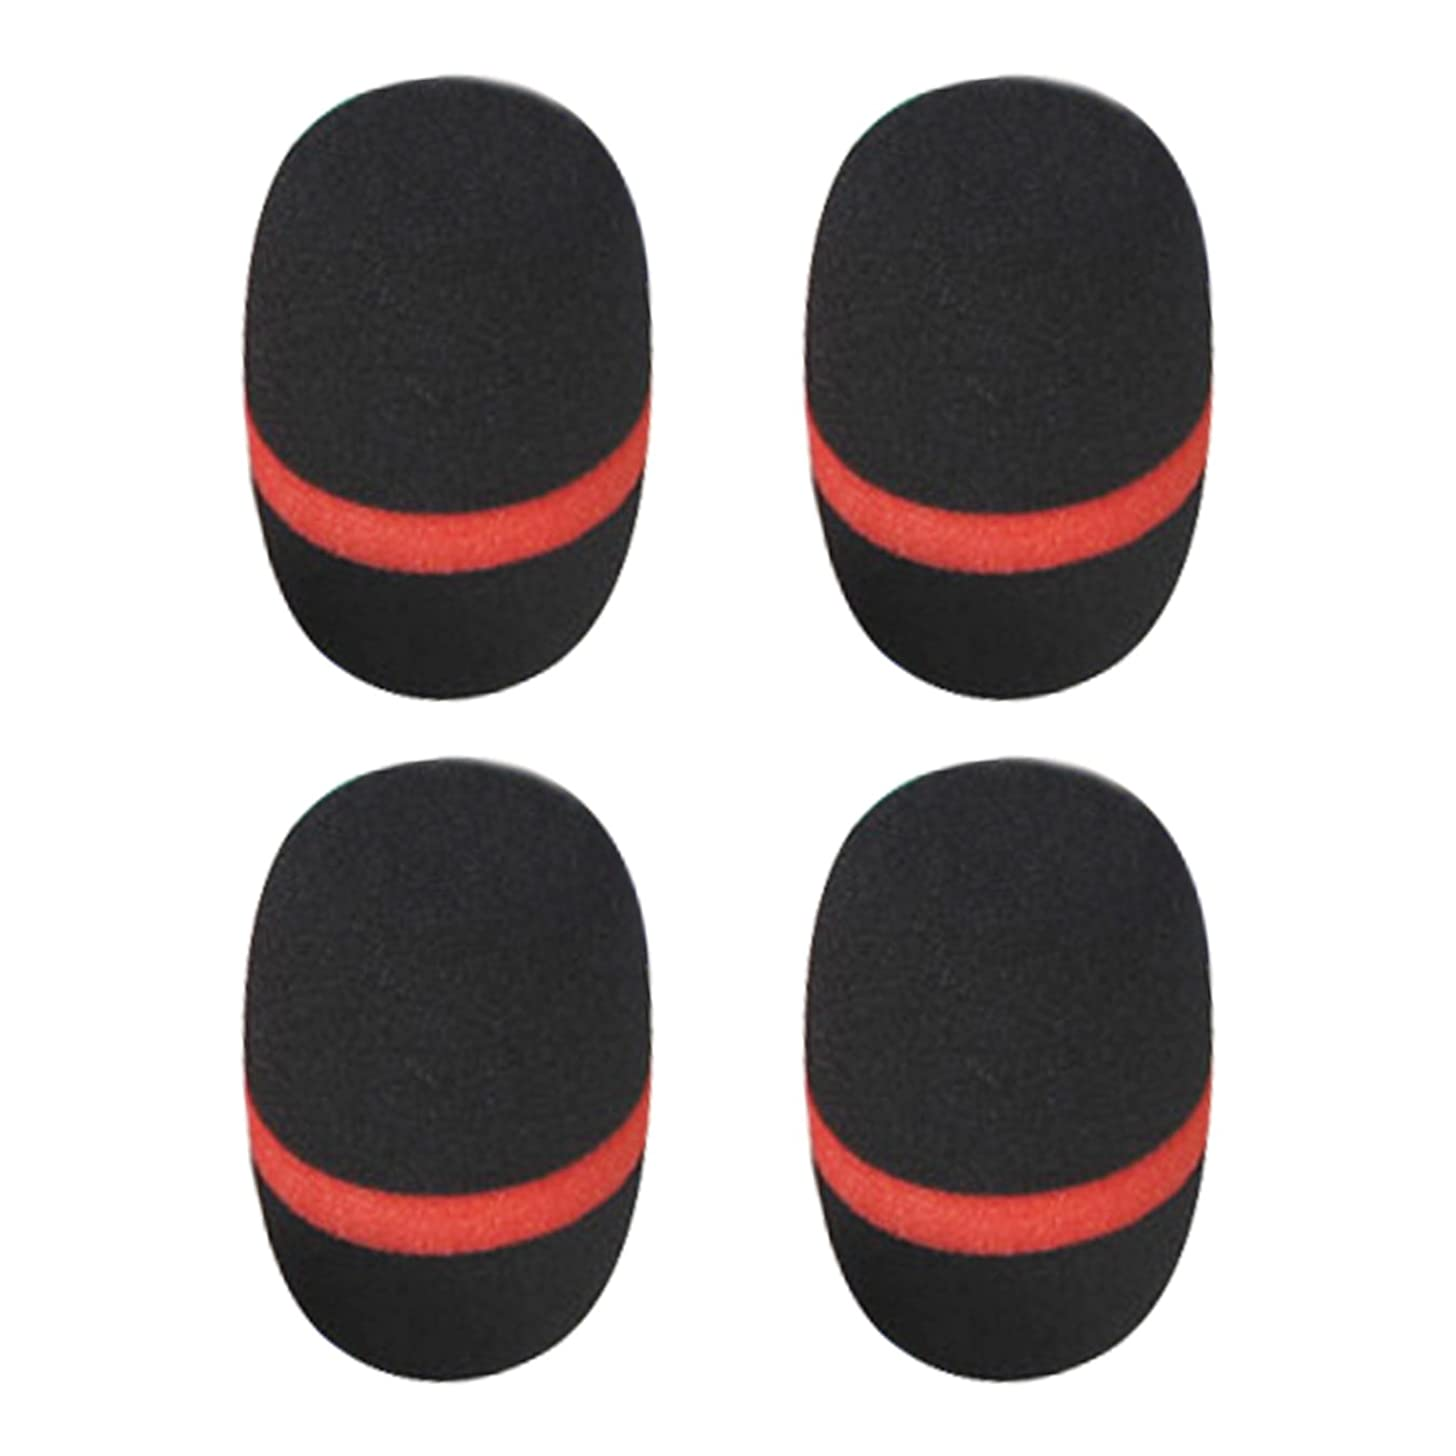 UOOOM 4 pcs Colorful Handheld Microphone Foam Cover Large Mic Windscreen (Black)